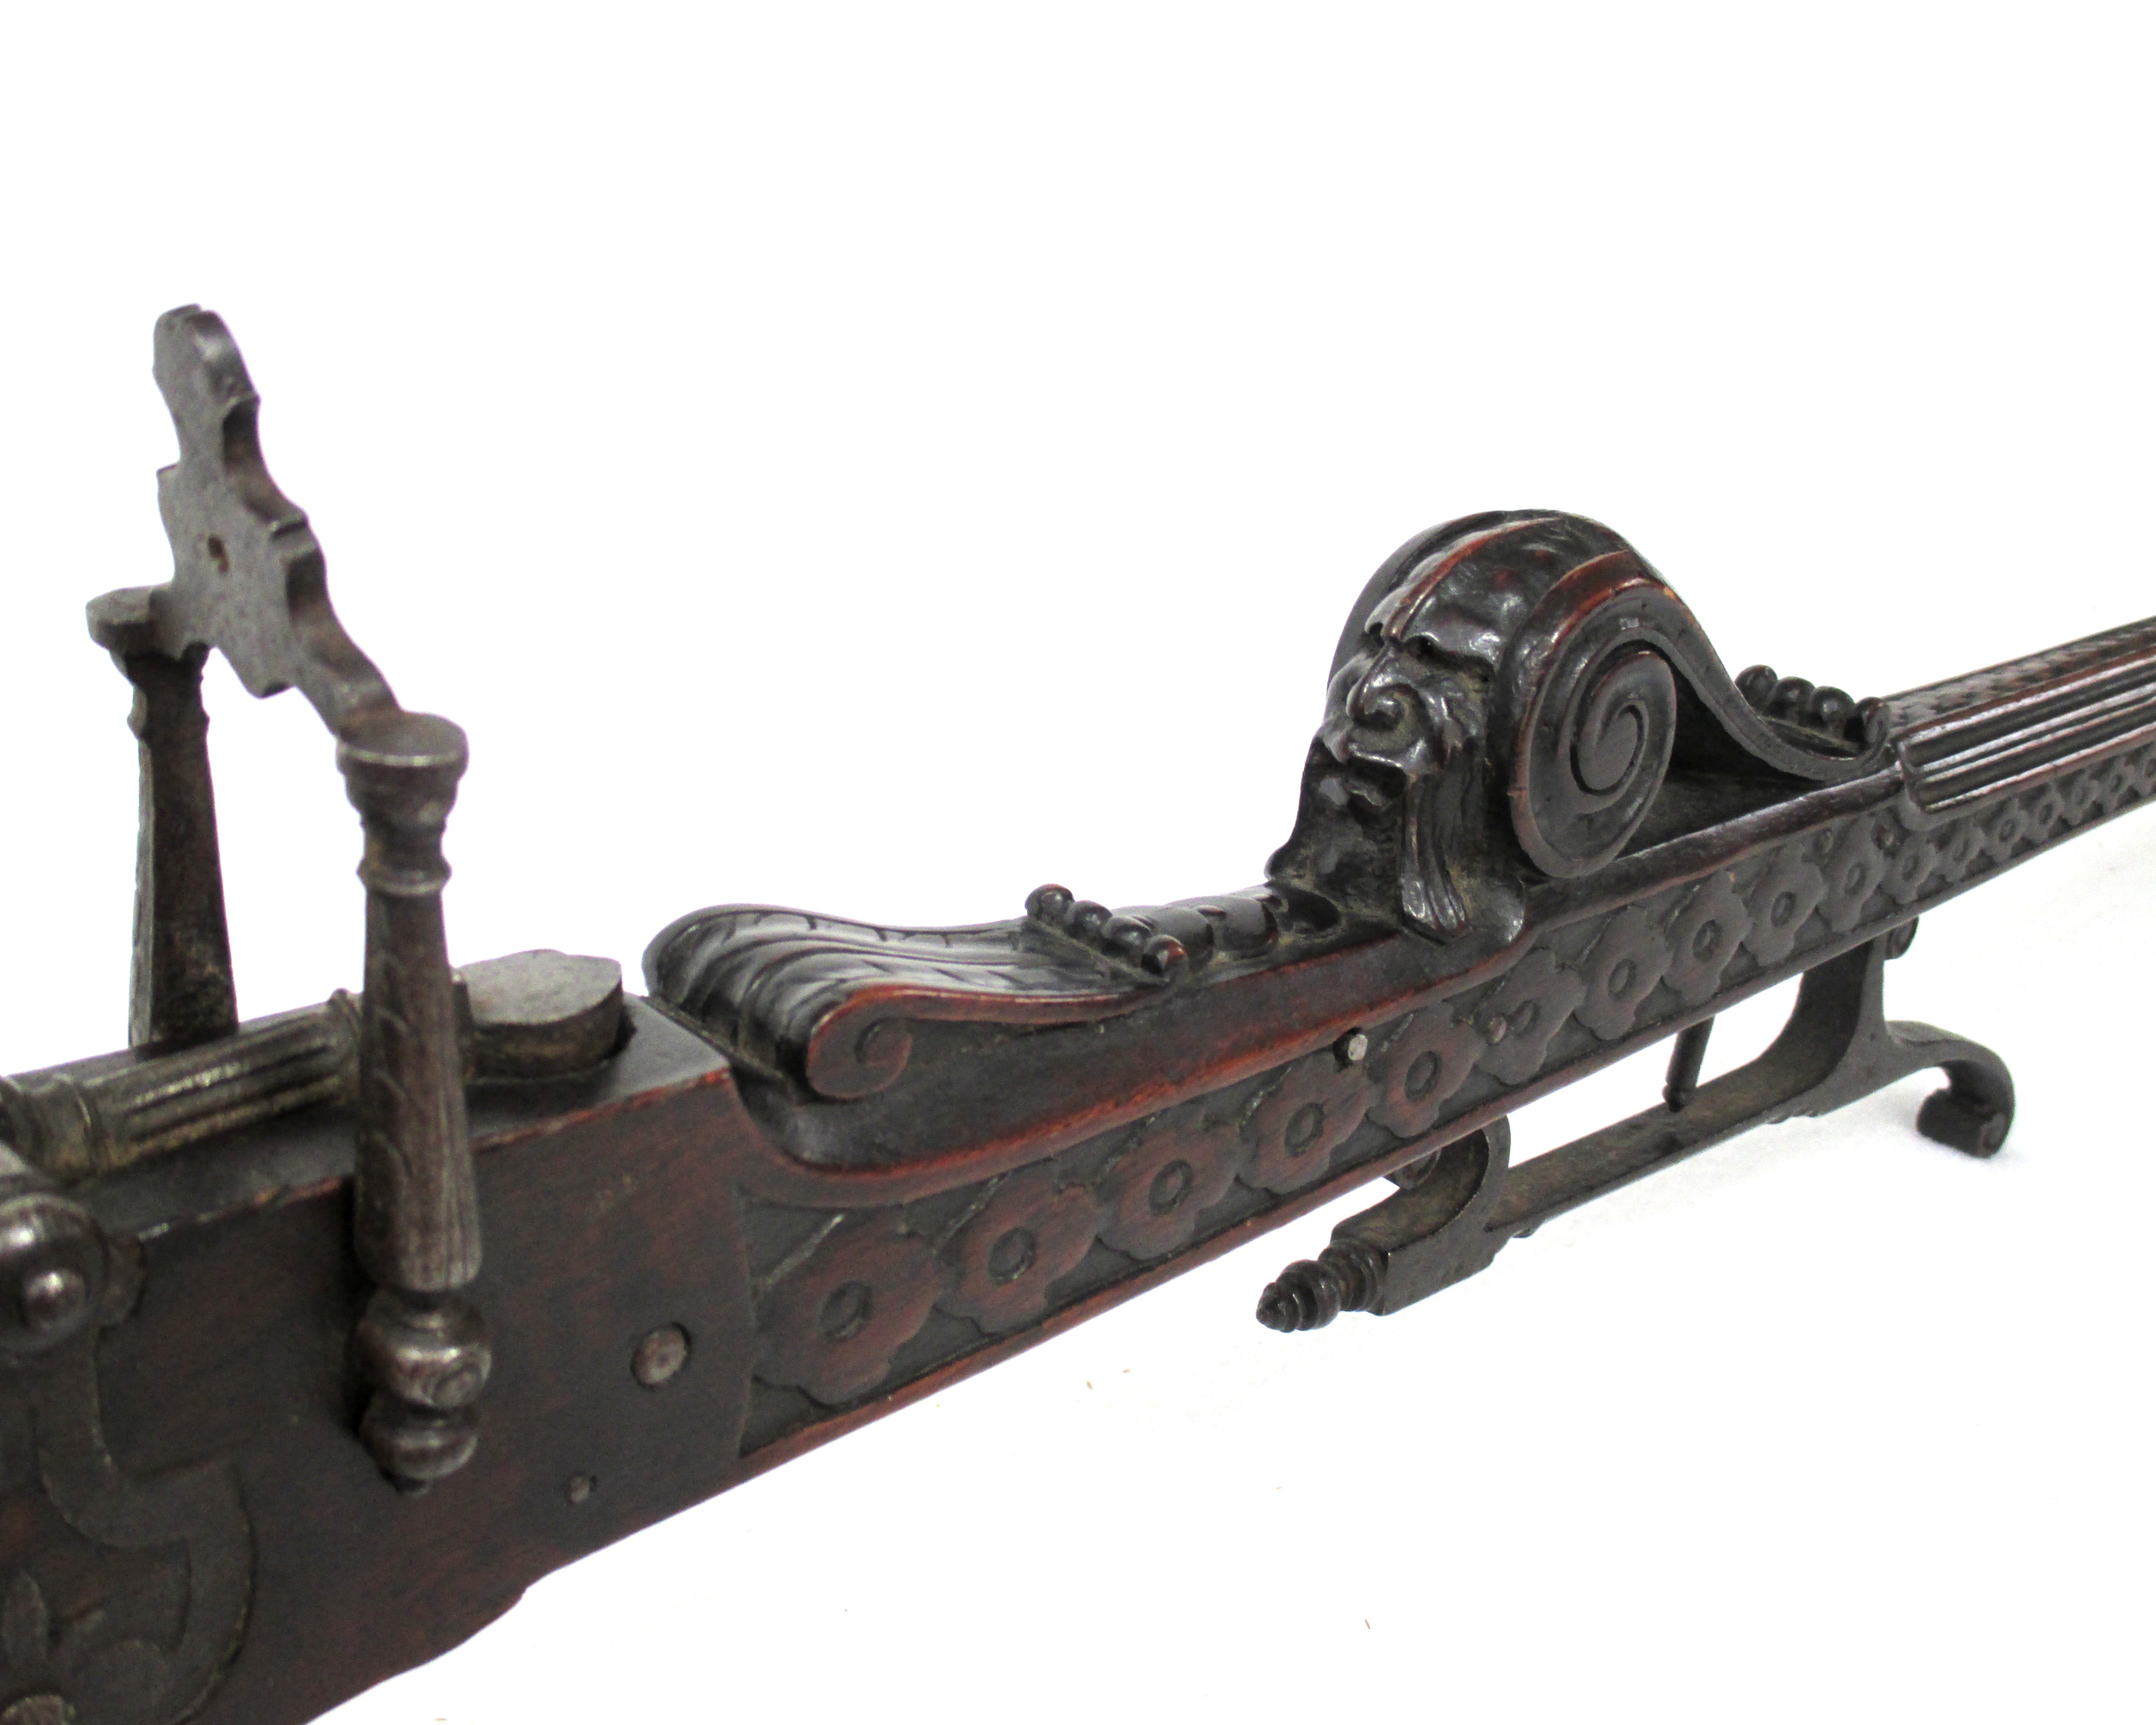 italian-stonebow-crossbow-tuscany-16thc-gary-friedland-arms-armor-weapons5.jpg